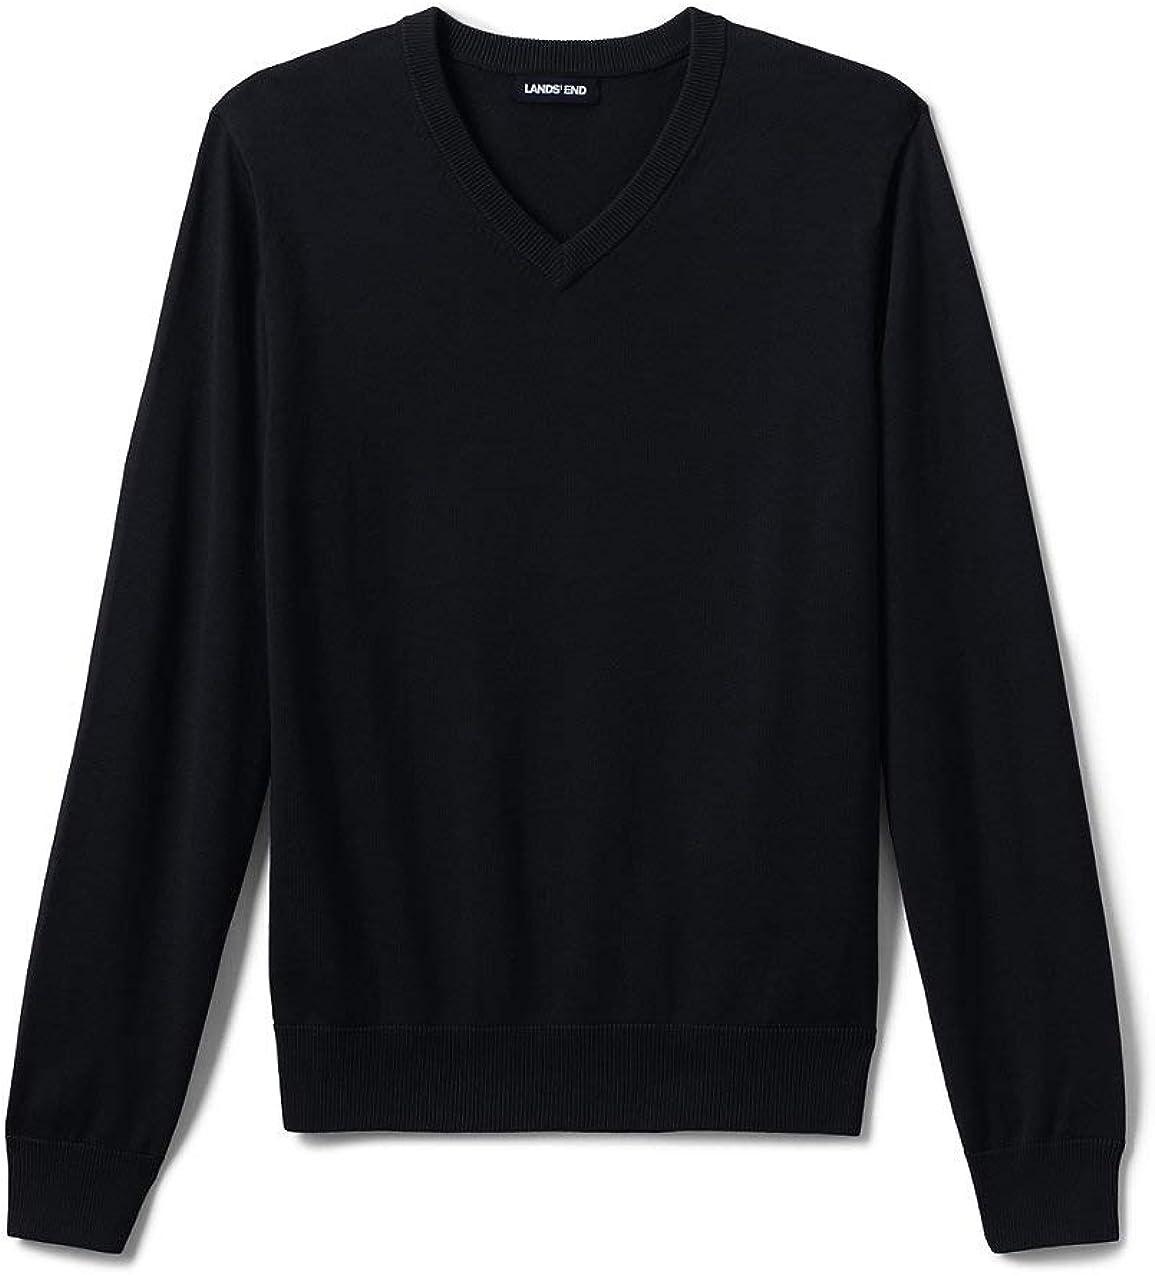 Lands' End School Uniform Men's Cotton Modal Fine Gauge V-Neck Sweater